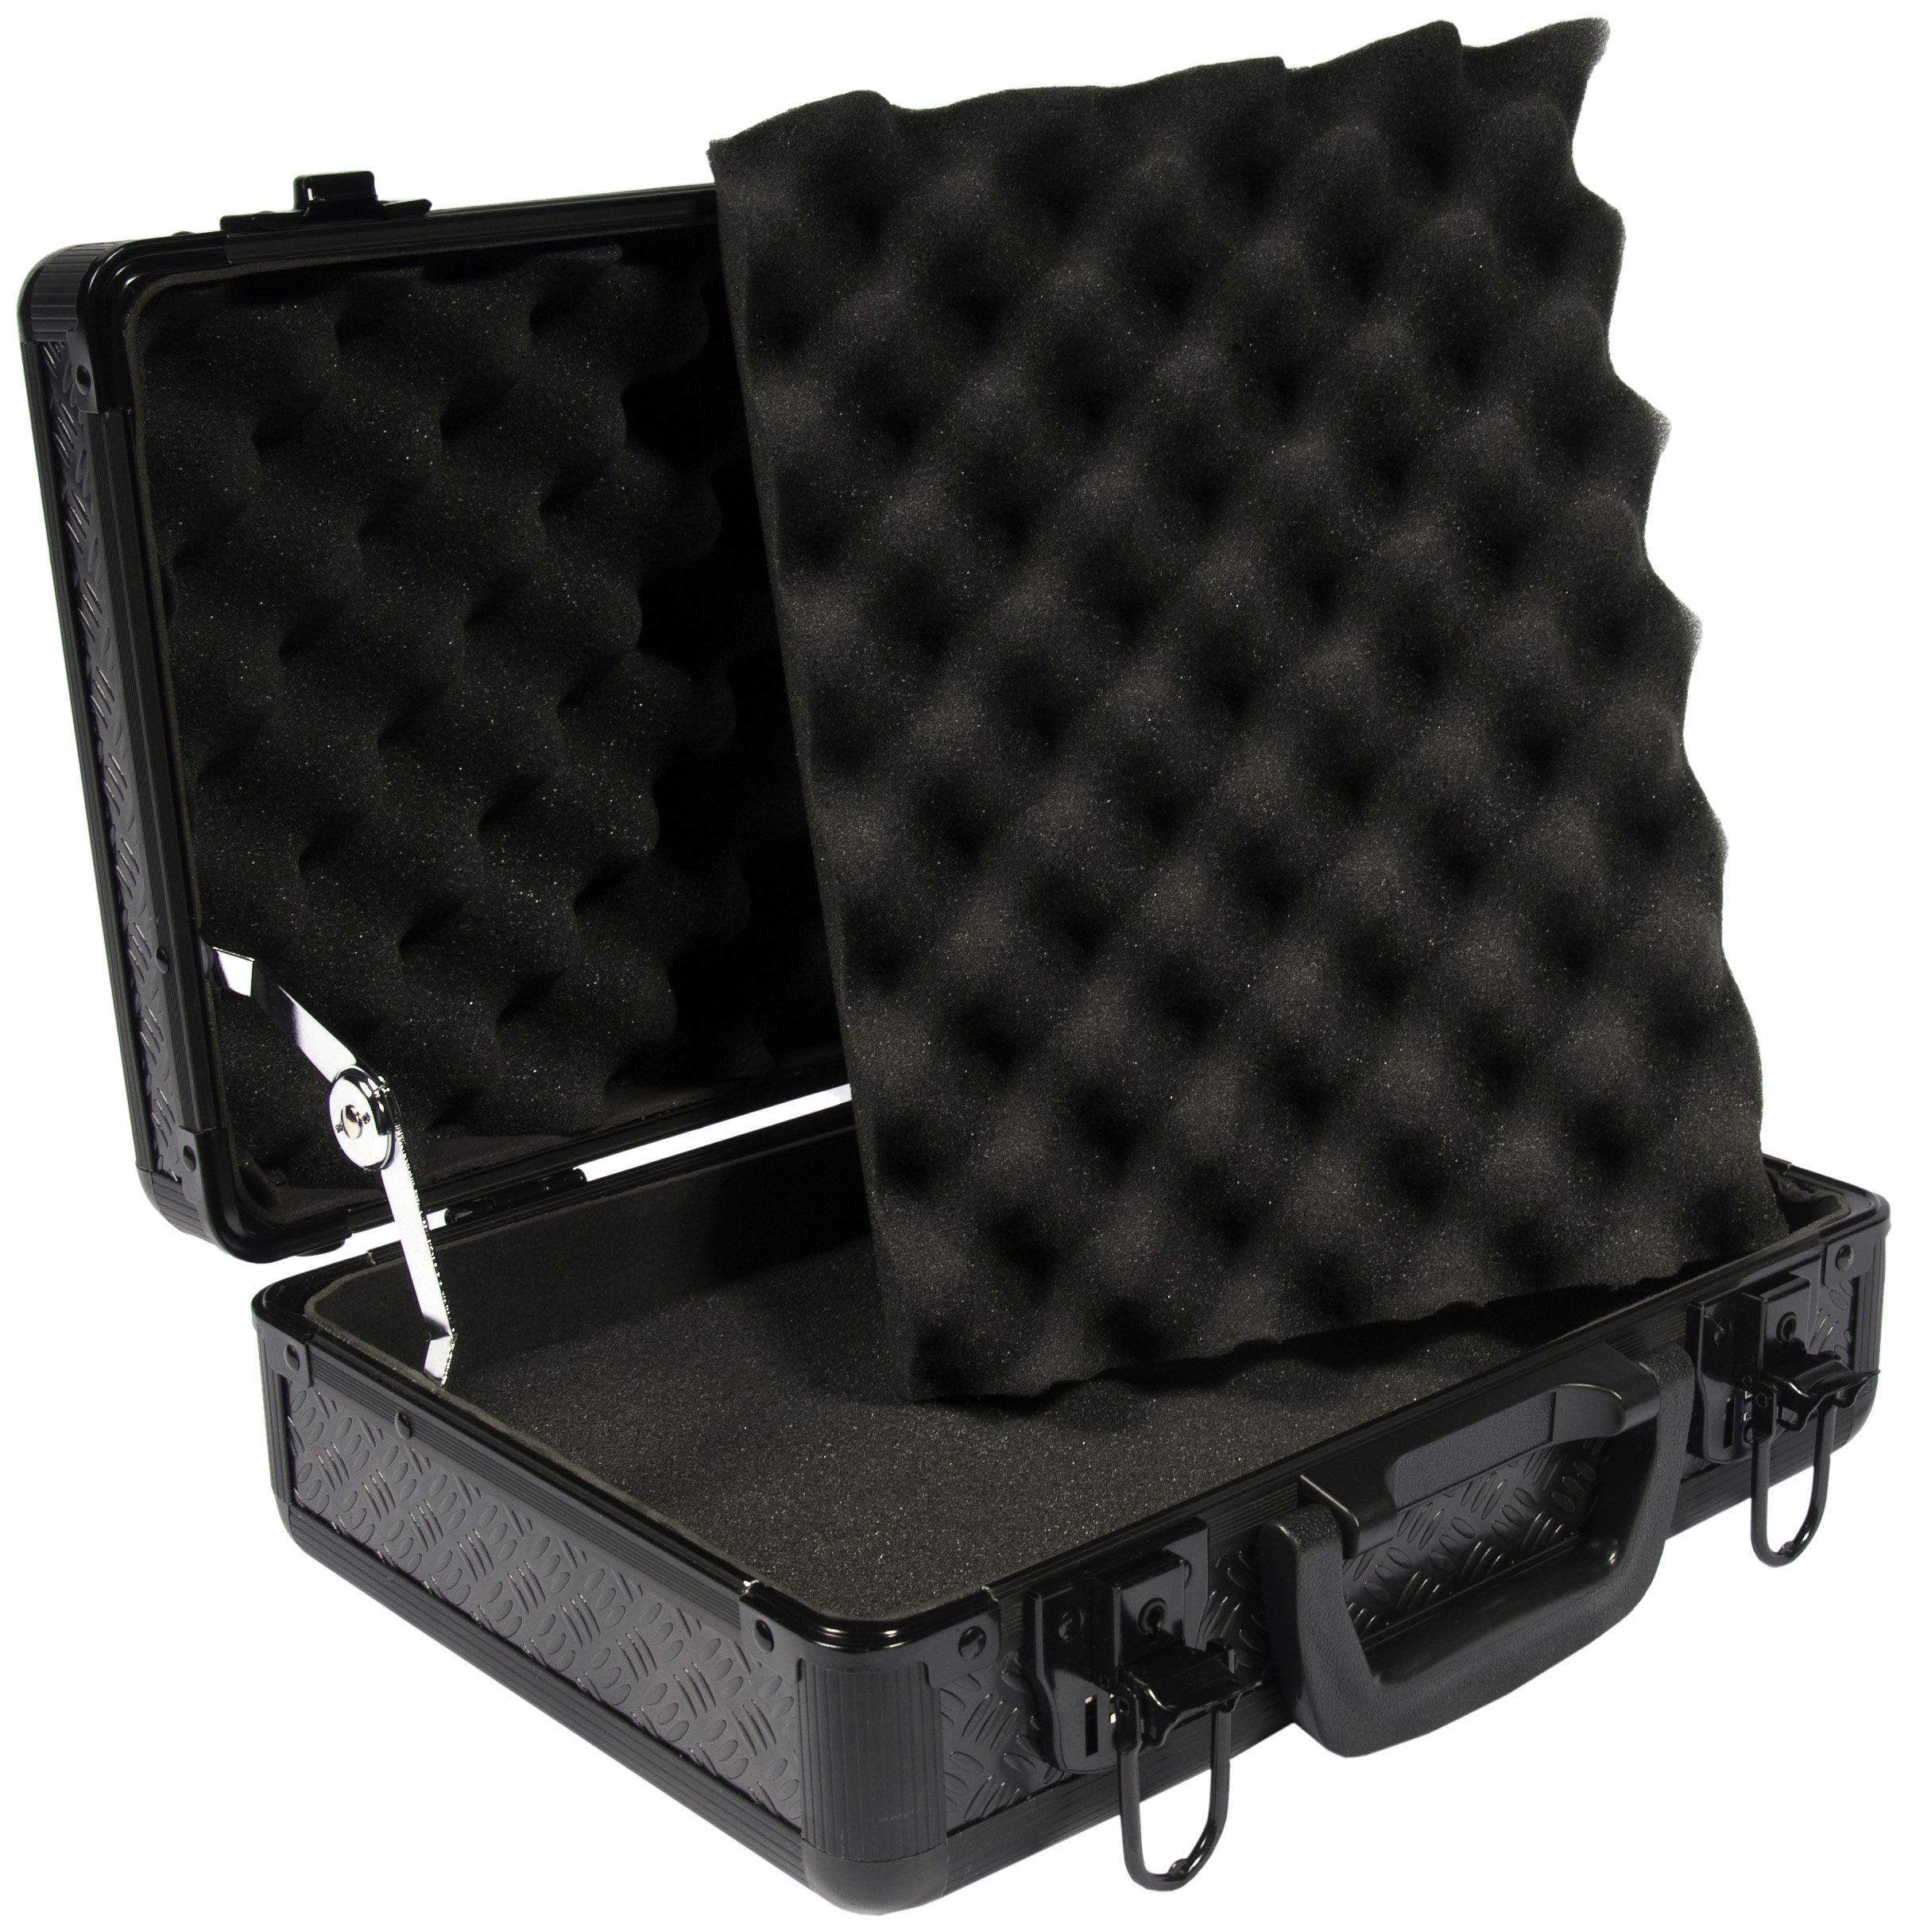 Sportlock Aluminumlock Series Double Pistol Case